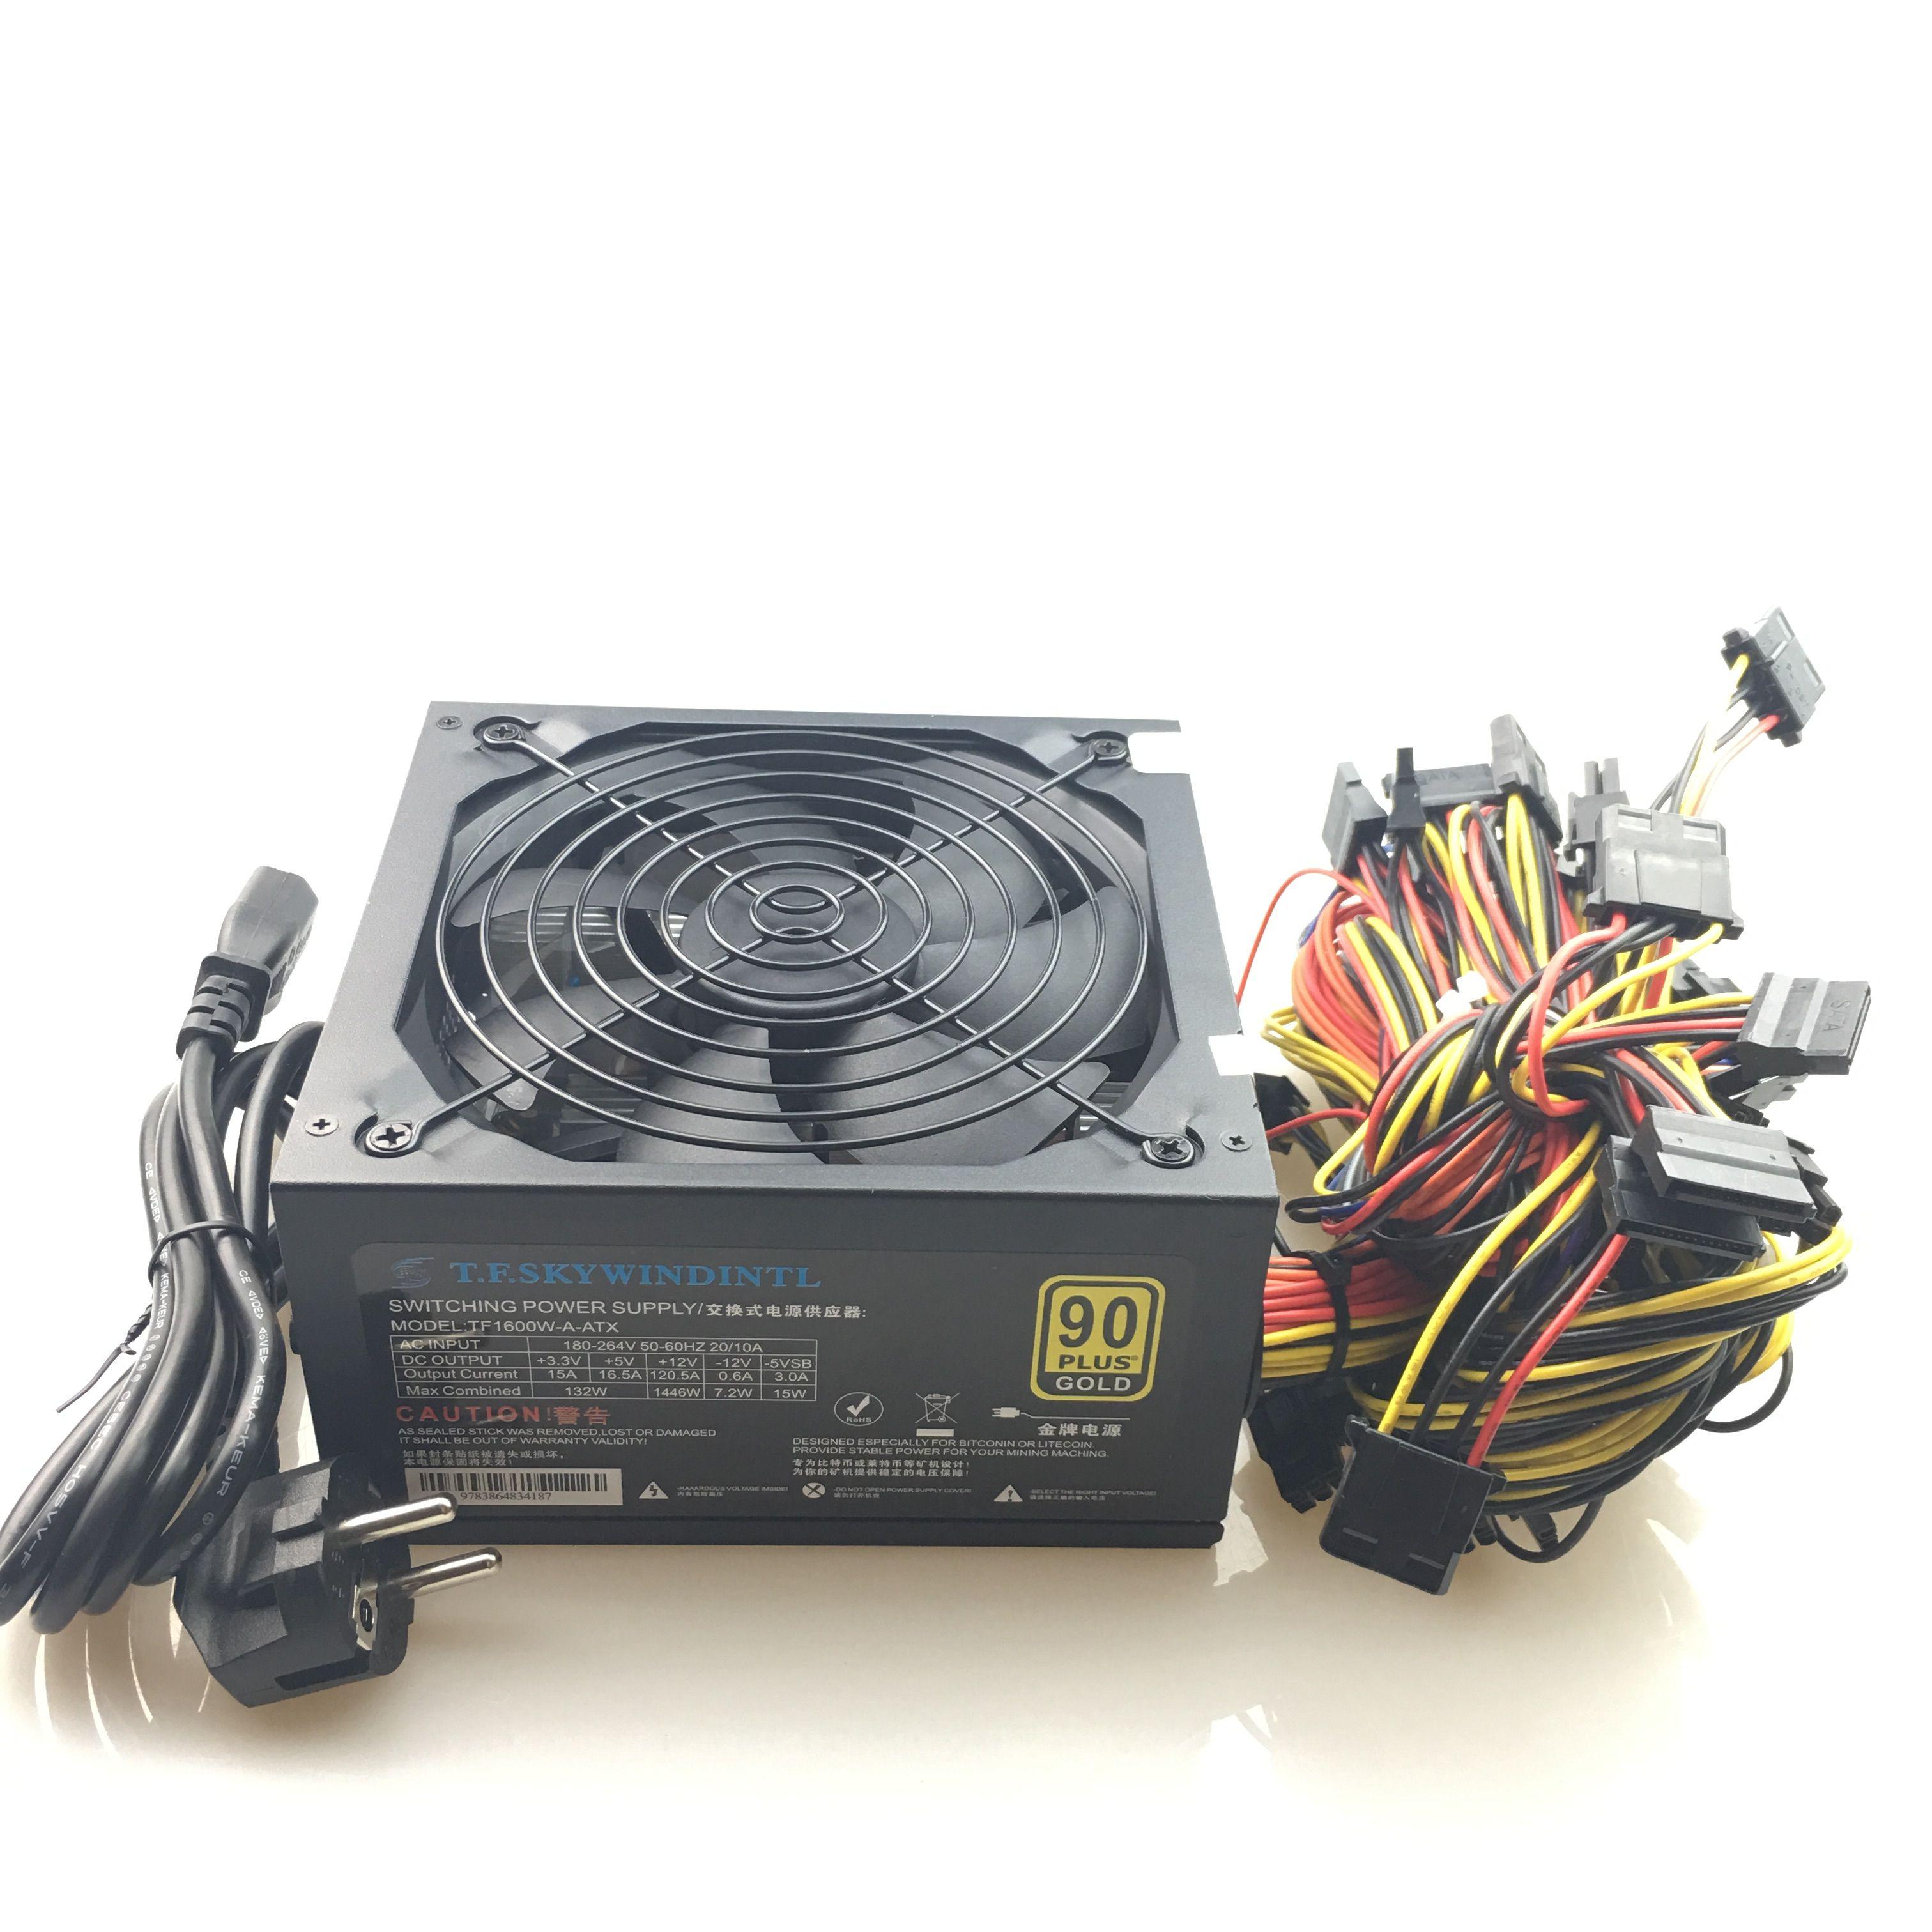 1600w Pc Power Supply Atx Miner Power Psu For Atx Mining Machine ...